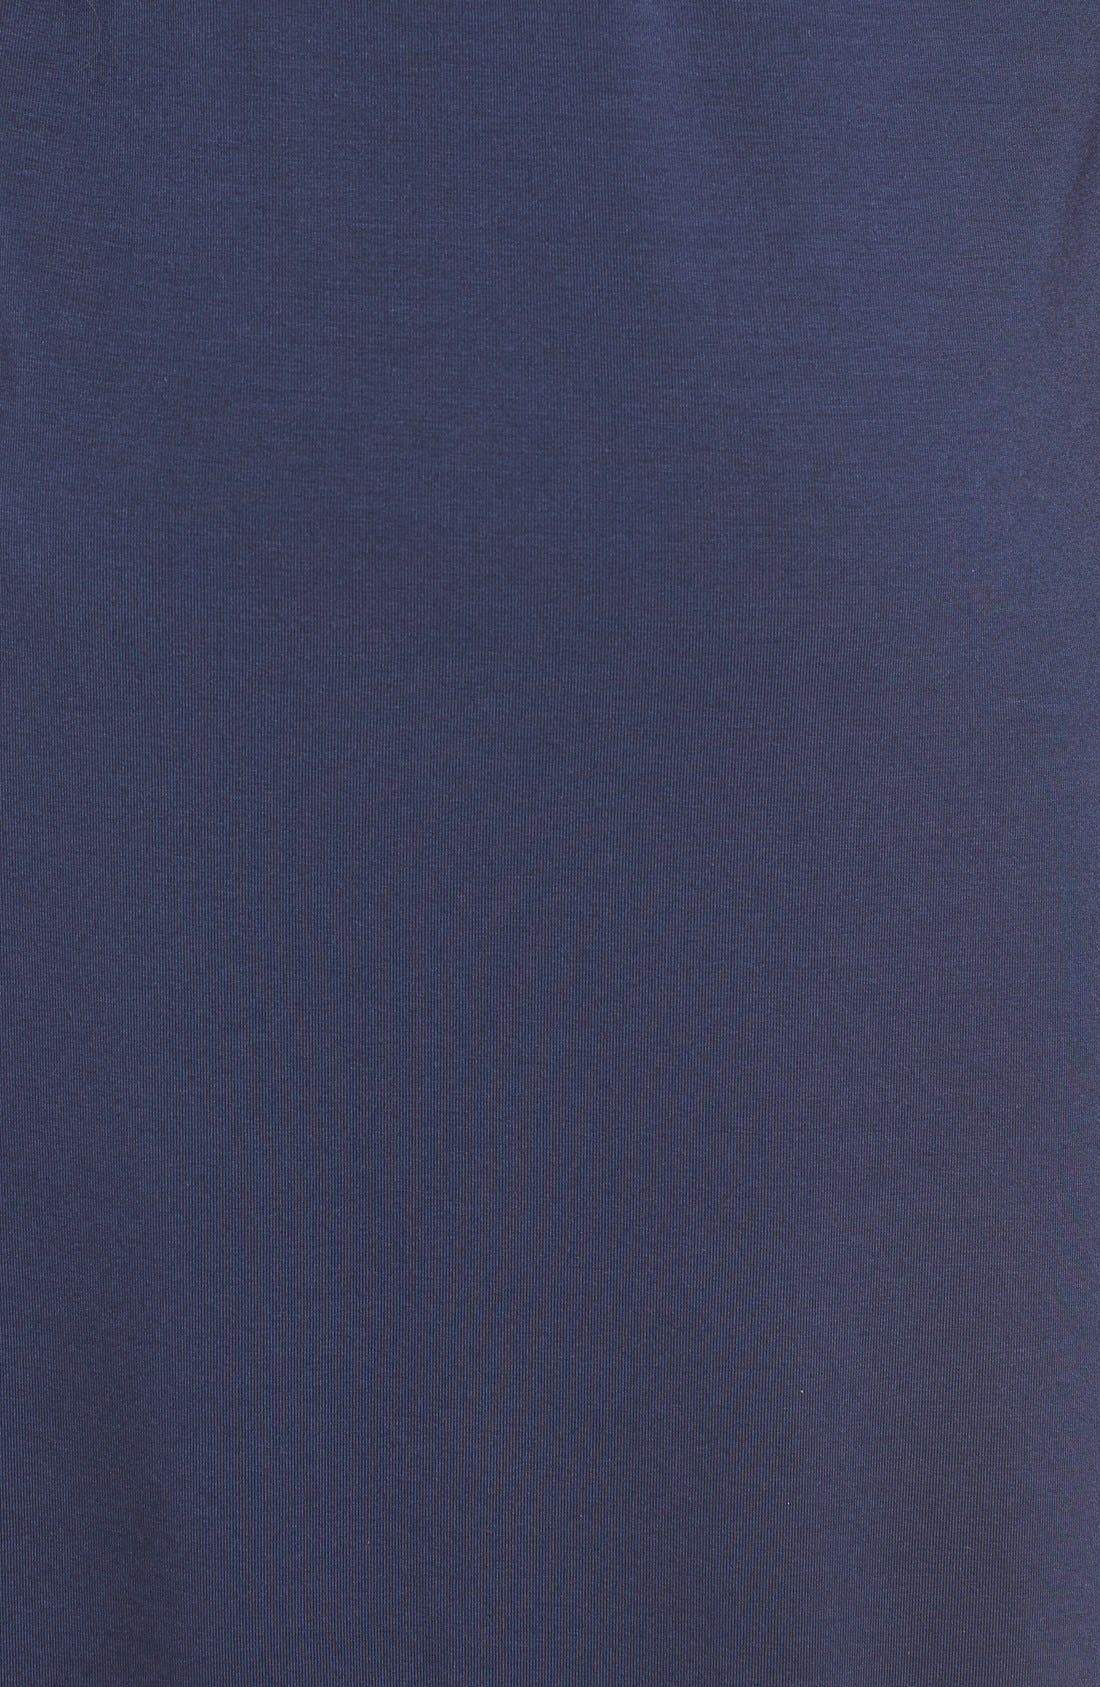 'Rhiannon' Turtleneck Fit & Flare Maternity Dress,                             Alternate thumbnail 5, color,                             Peacoat